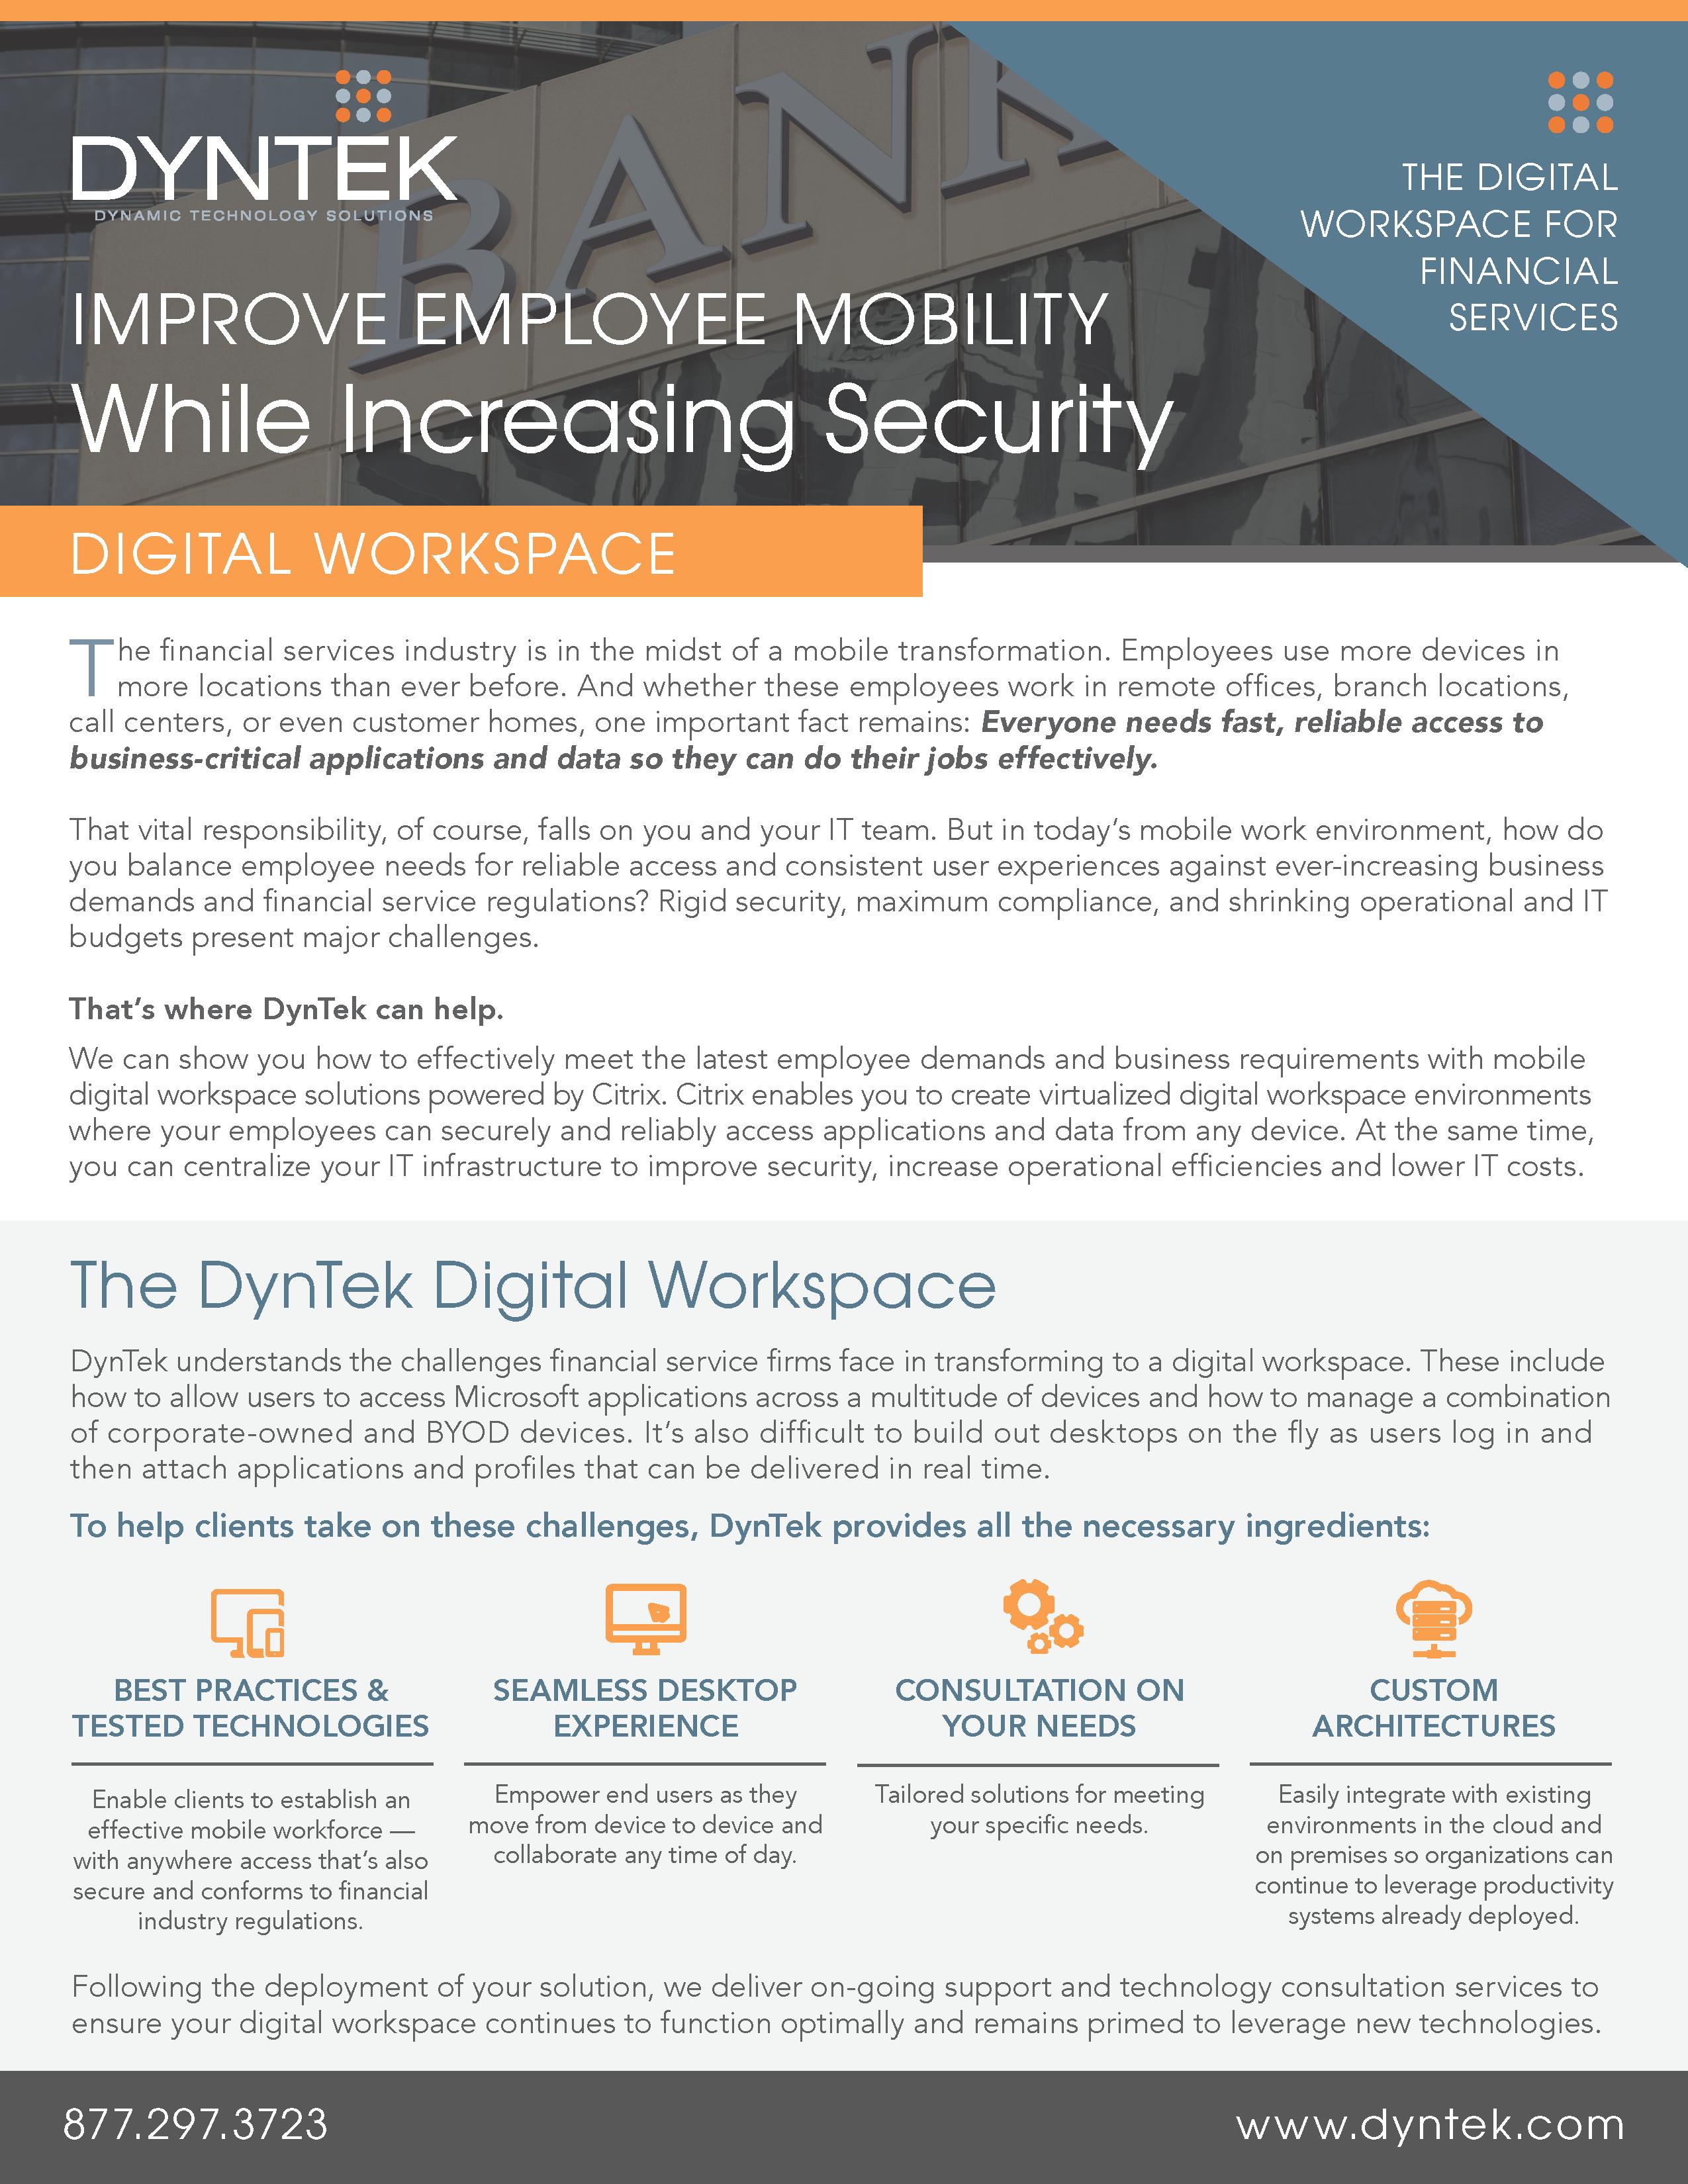 DynTek Digital Workspace-FinServ 2017_Page_1